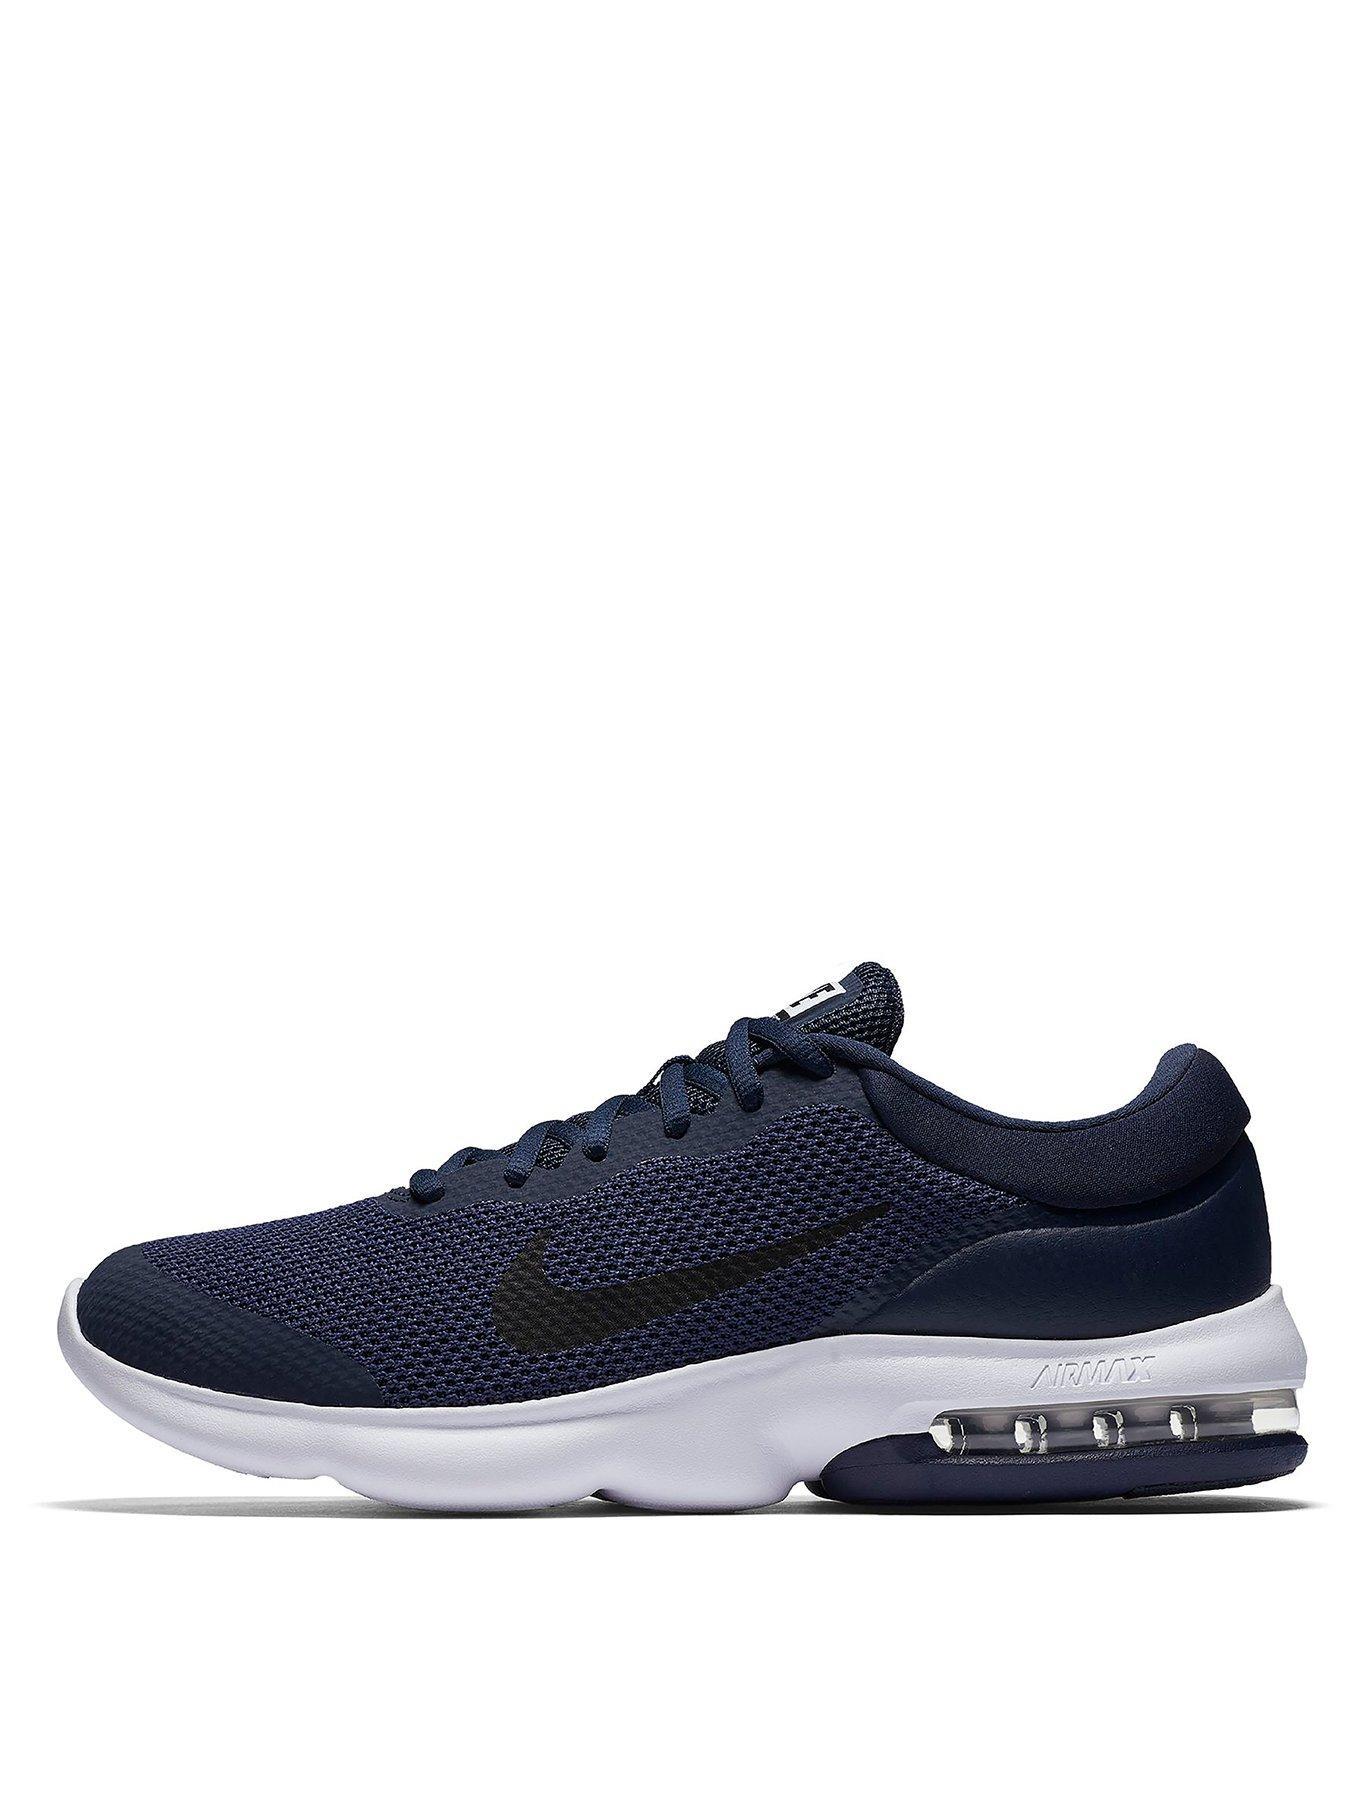 Nike Air Max Advantage 1600190599 Men's Shoes Nike Trainers